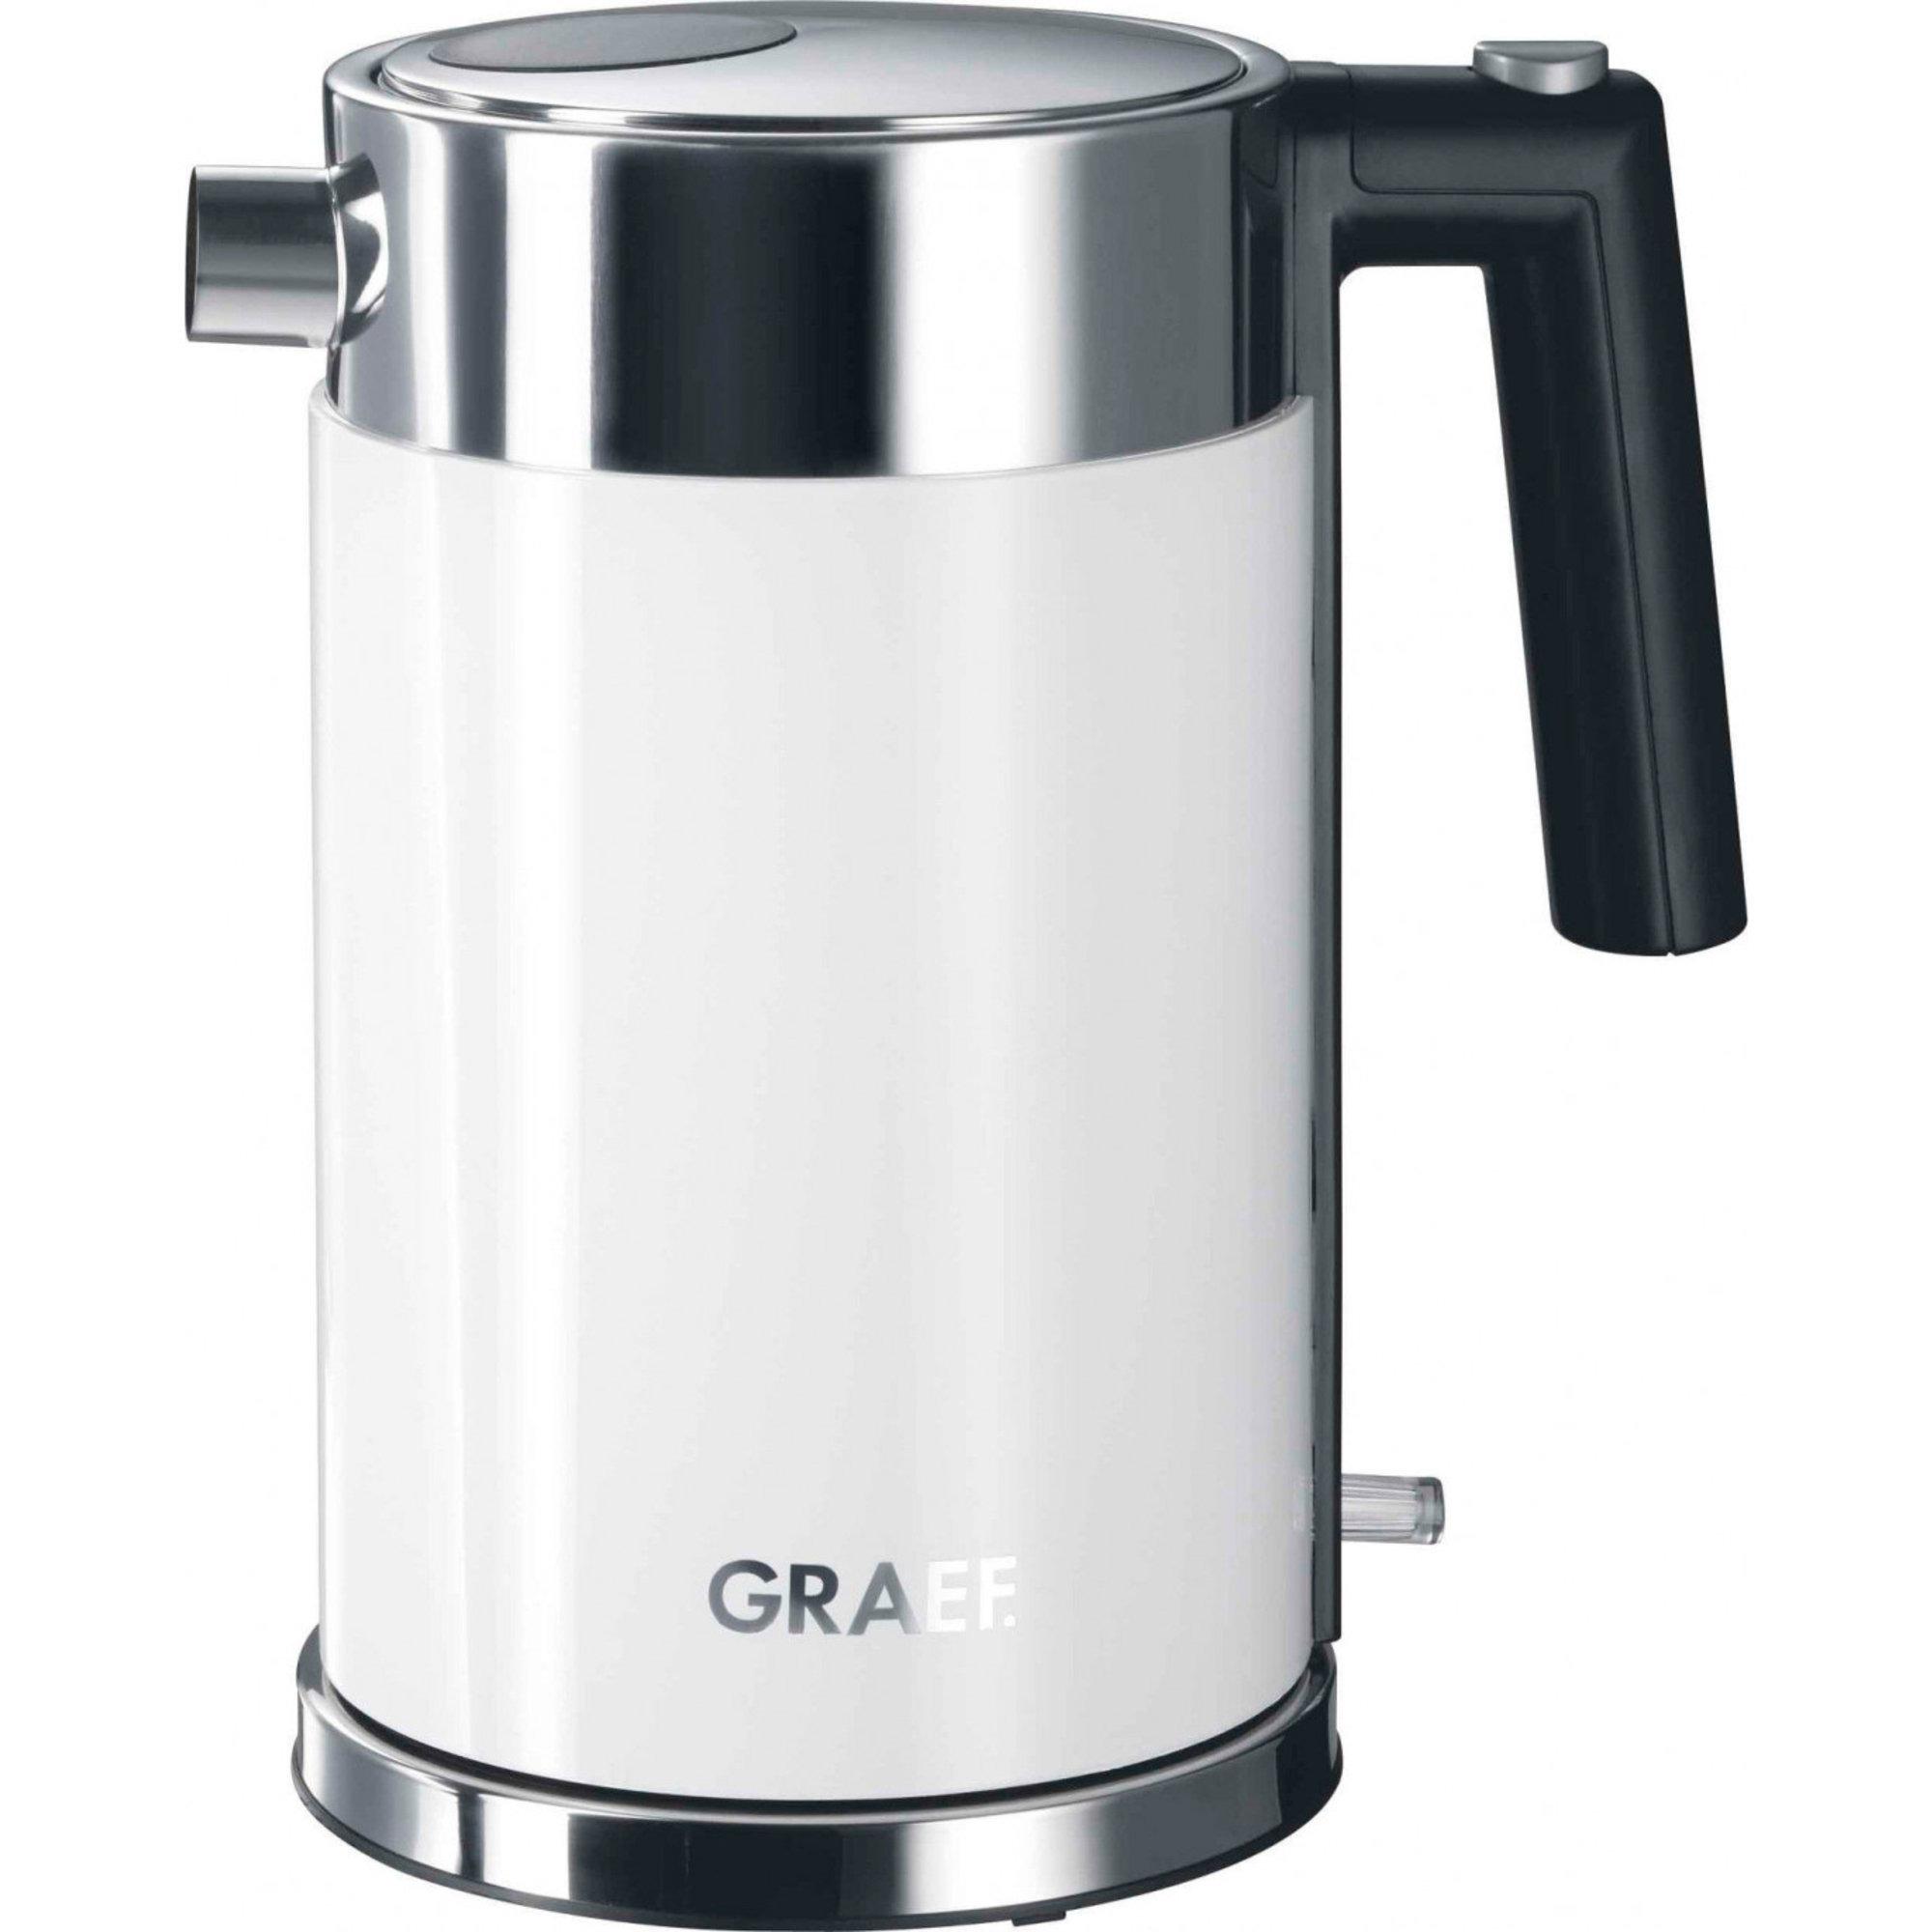 Graef Vattenkokare 10 liter